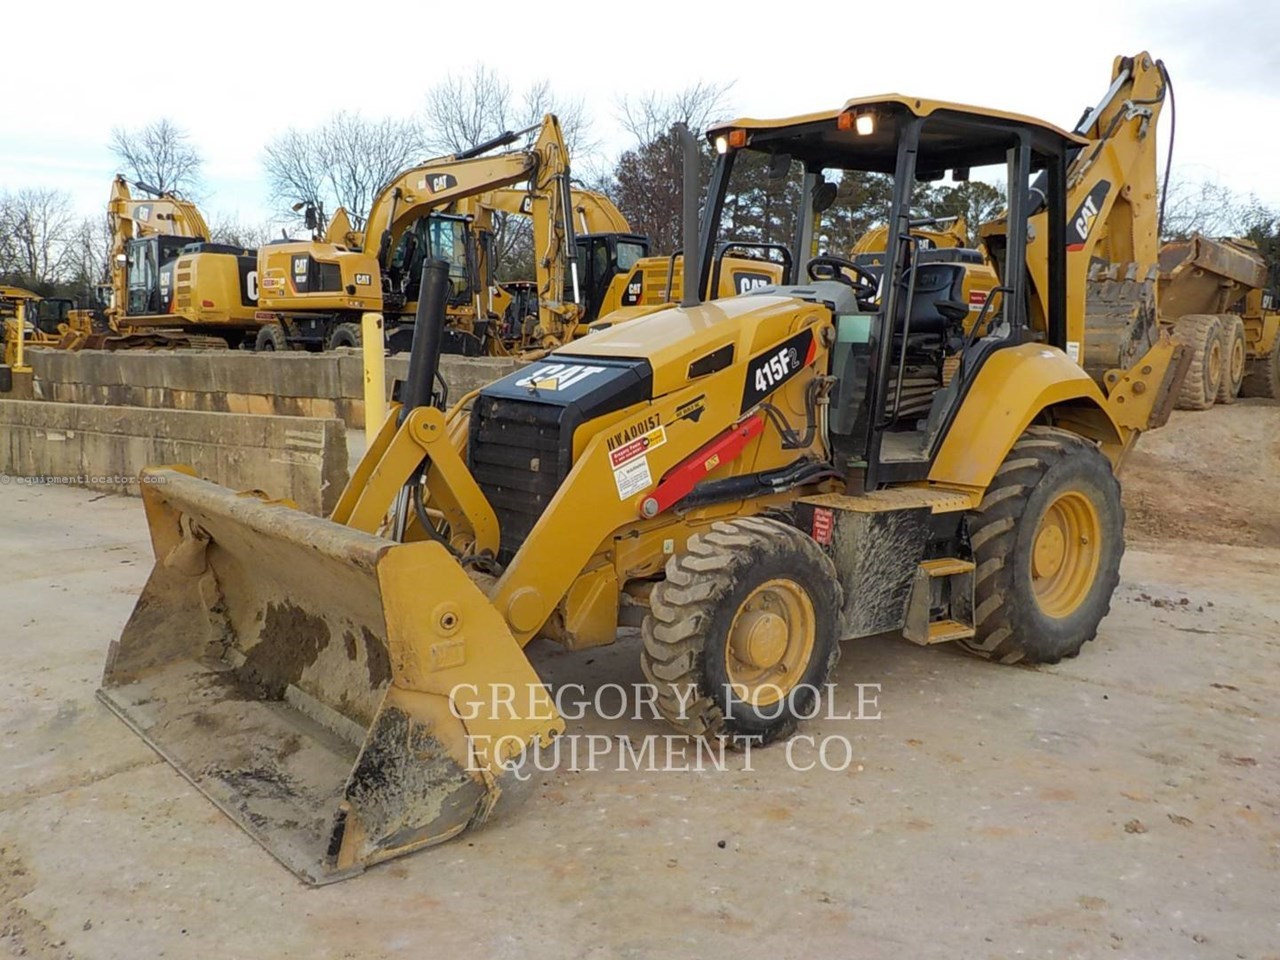 2015 Caterpillar 415F2 Image 1